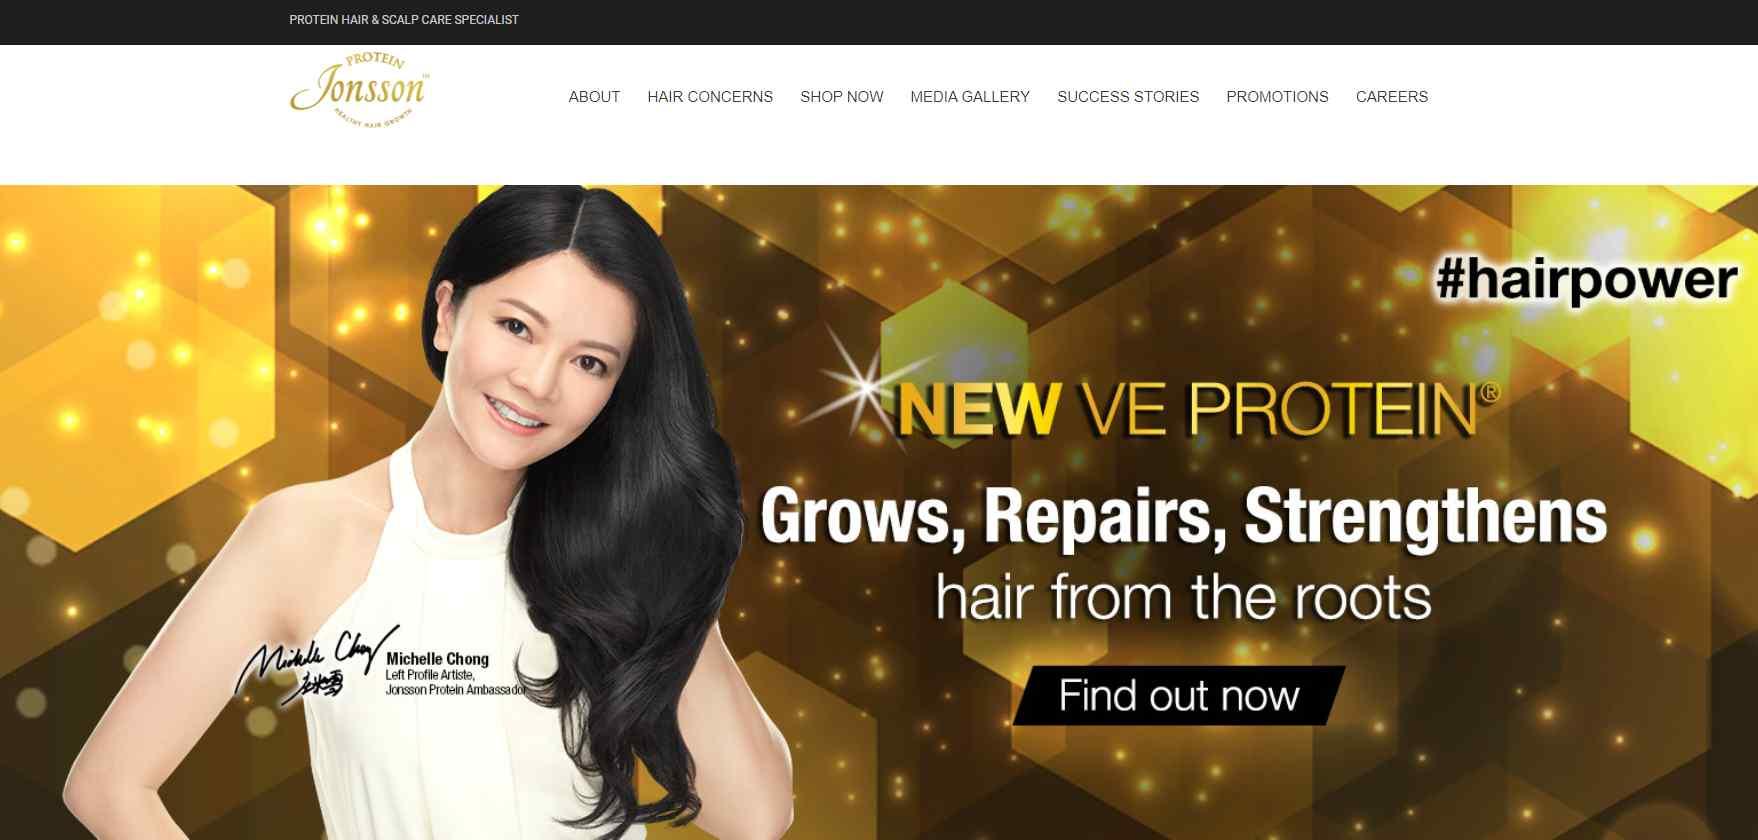 jonsson Top Hair Loss Treatment Clinics in Singapore